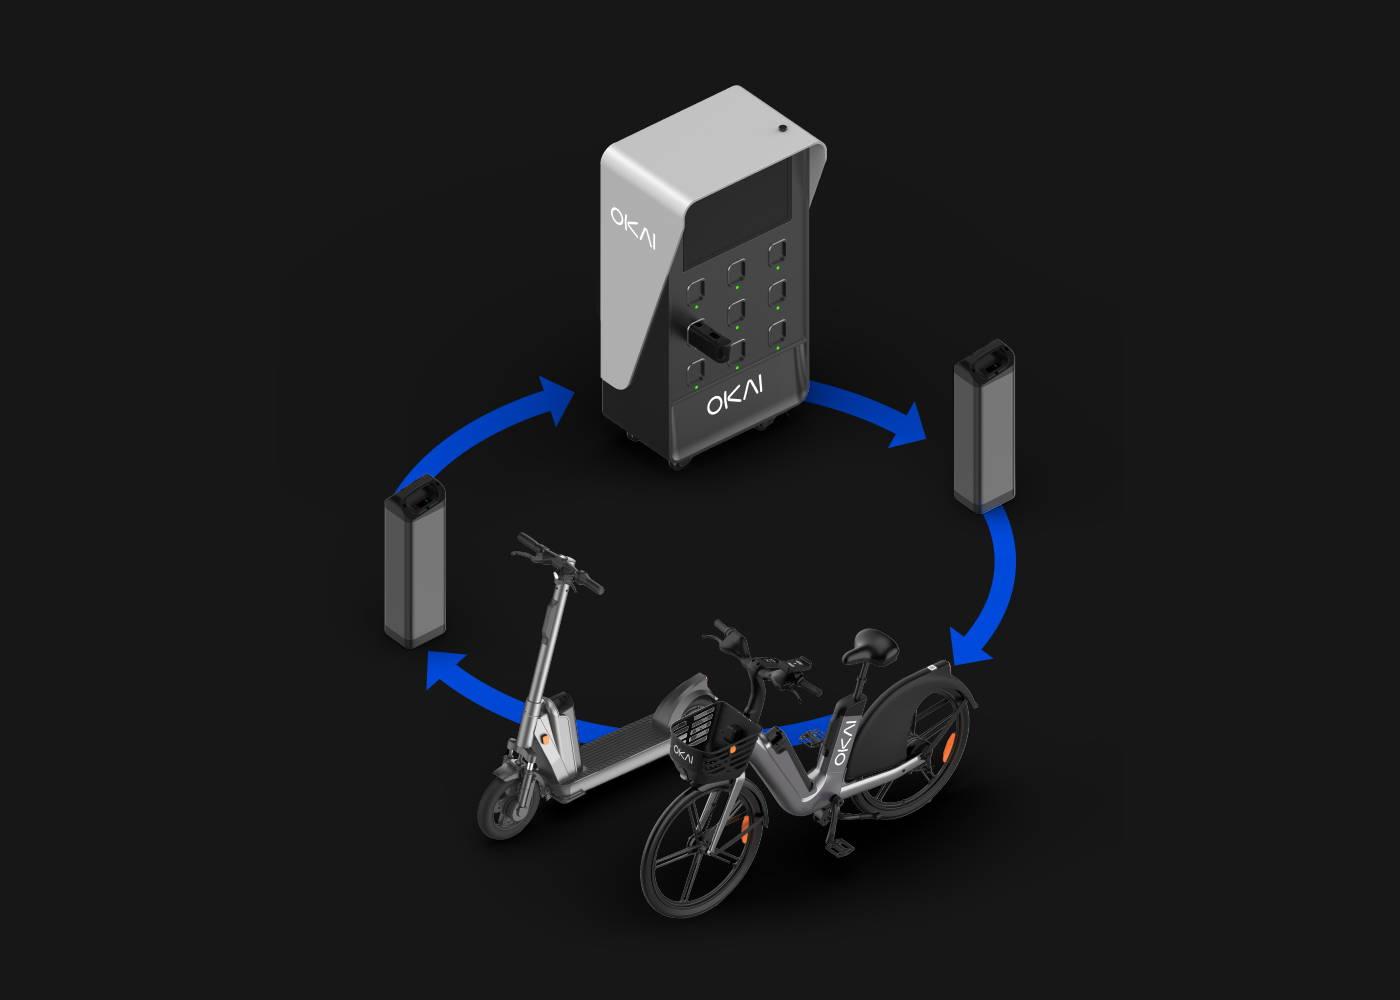 Charging-circle-eb100-es400b-cabinet-battery